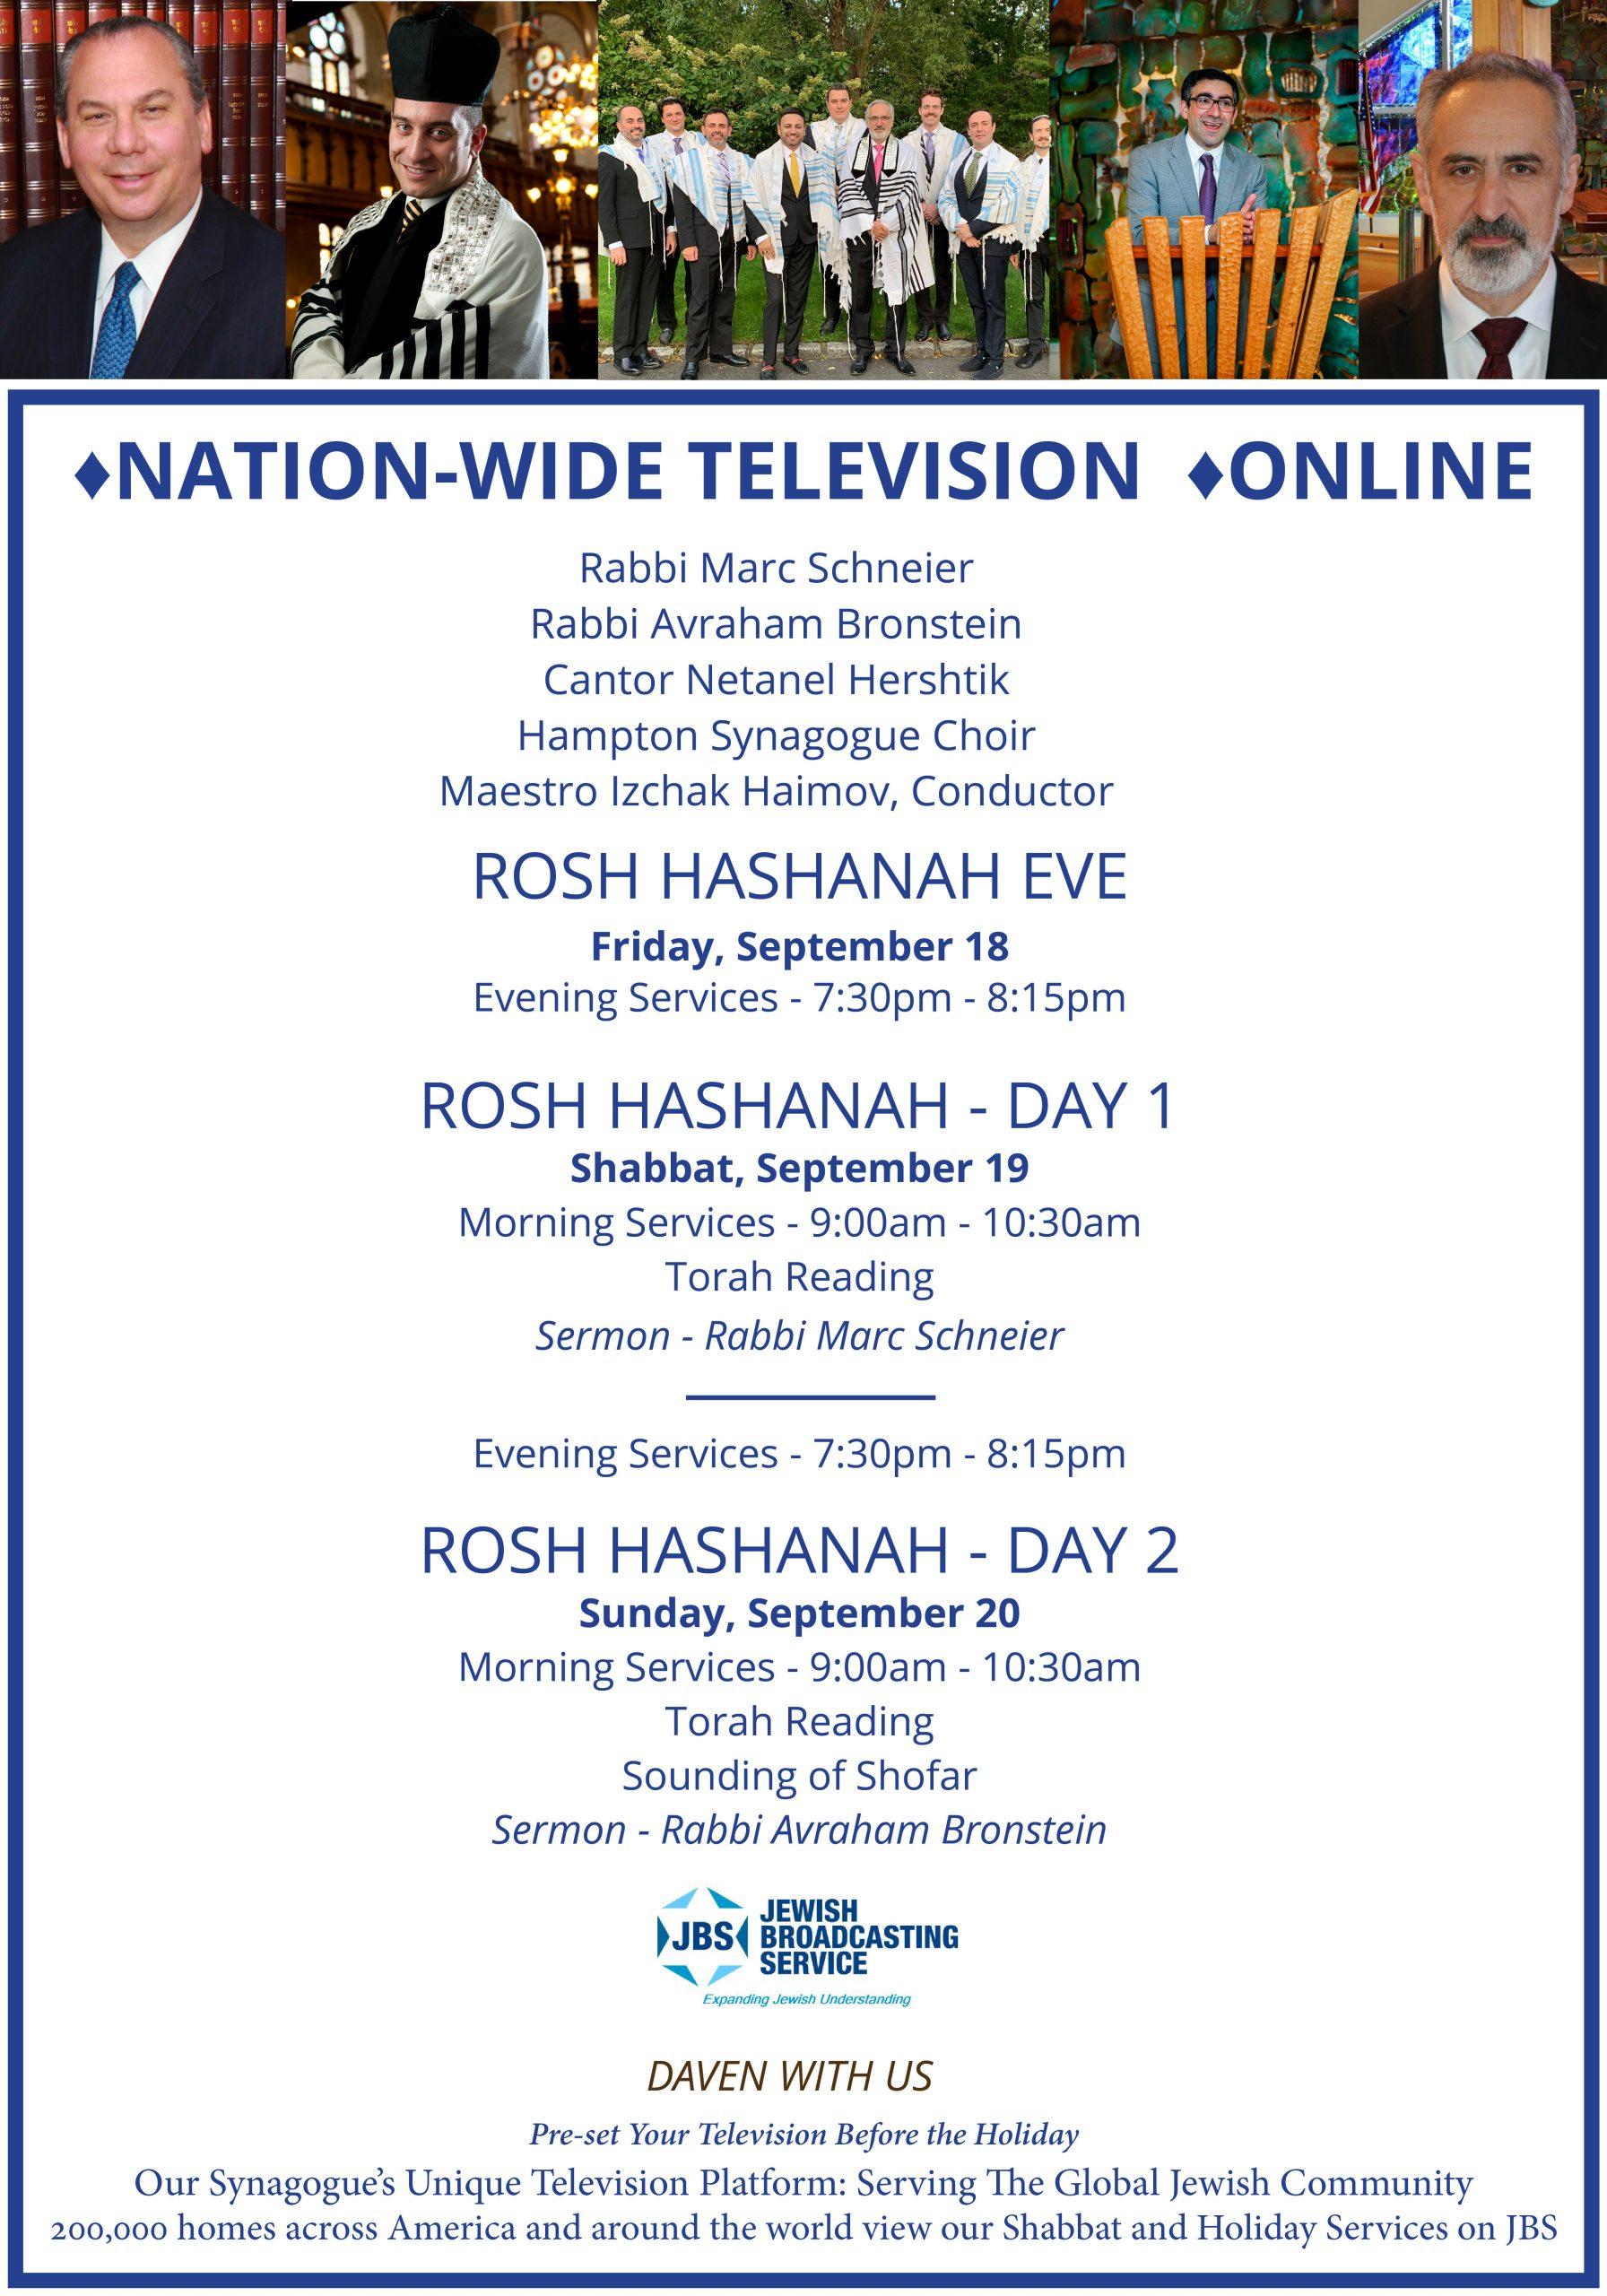 JBS TV Shabbat /Holiday Services & Special Programs